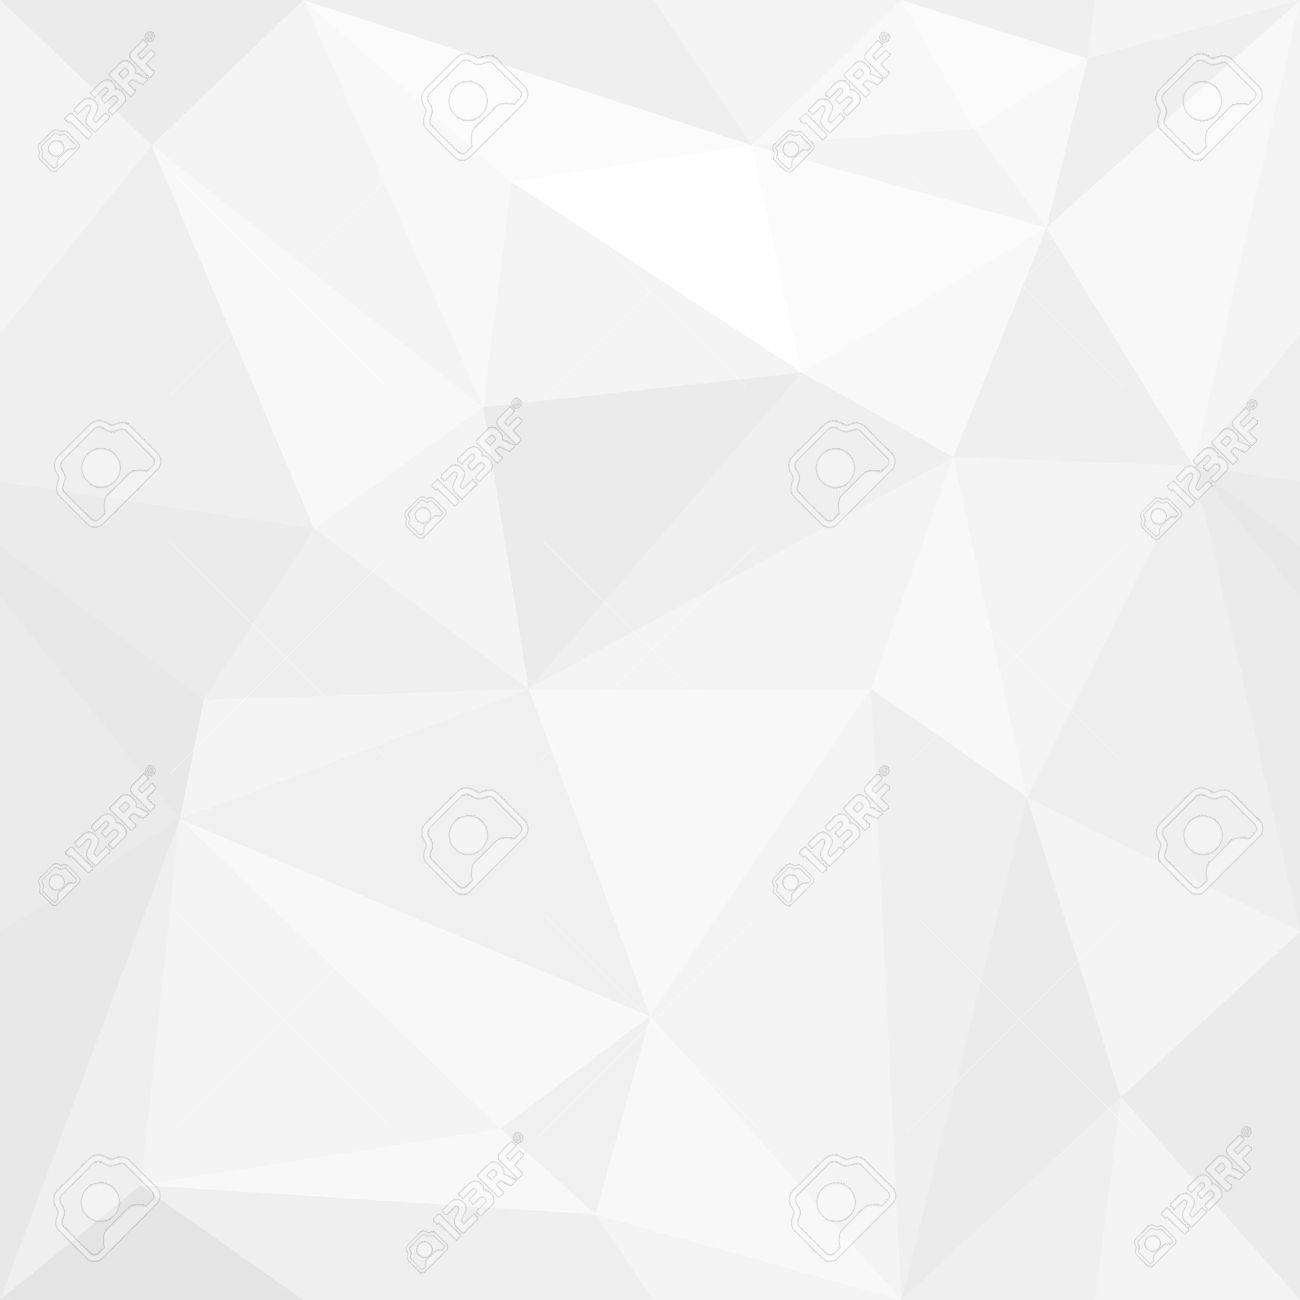 seamless white background pattern - 53599487